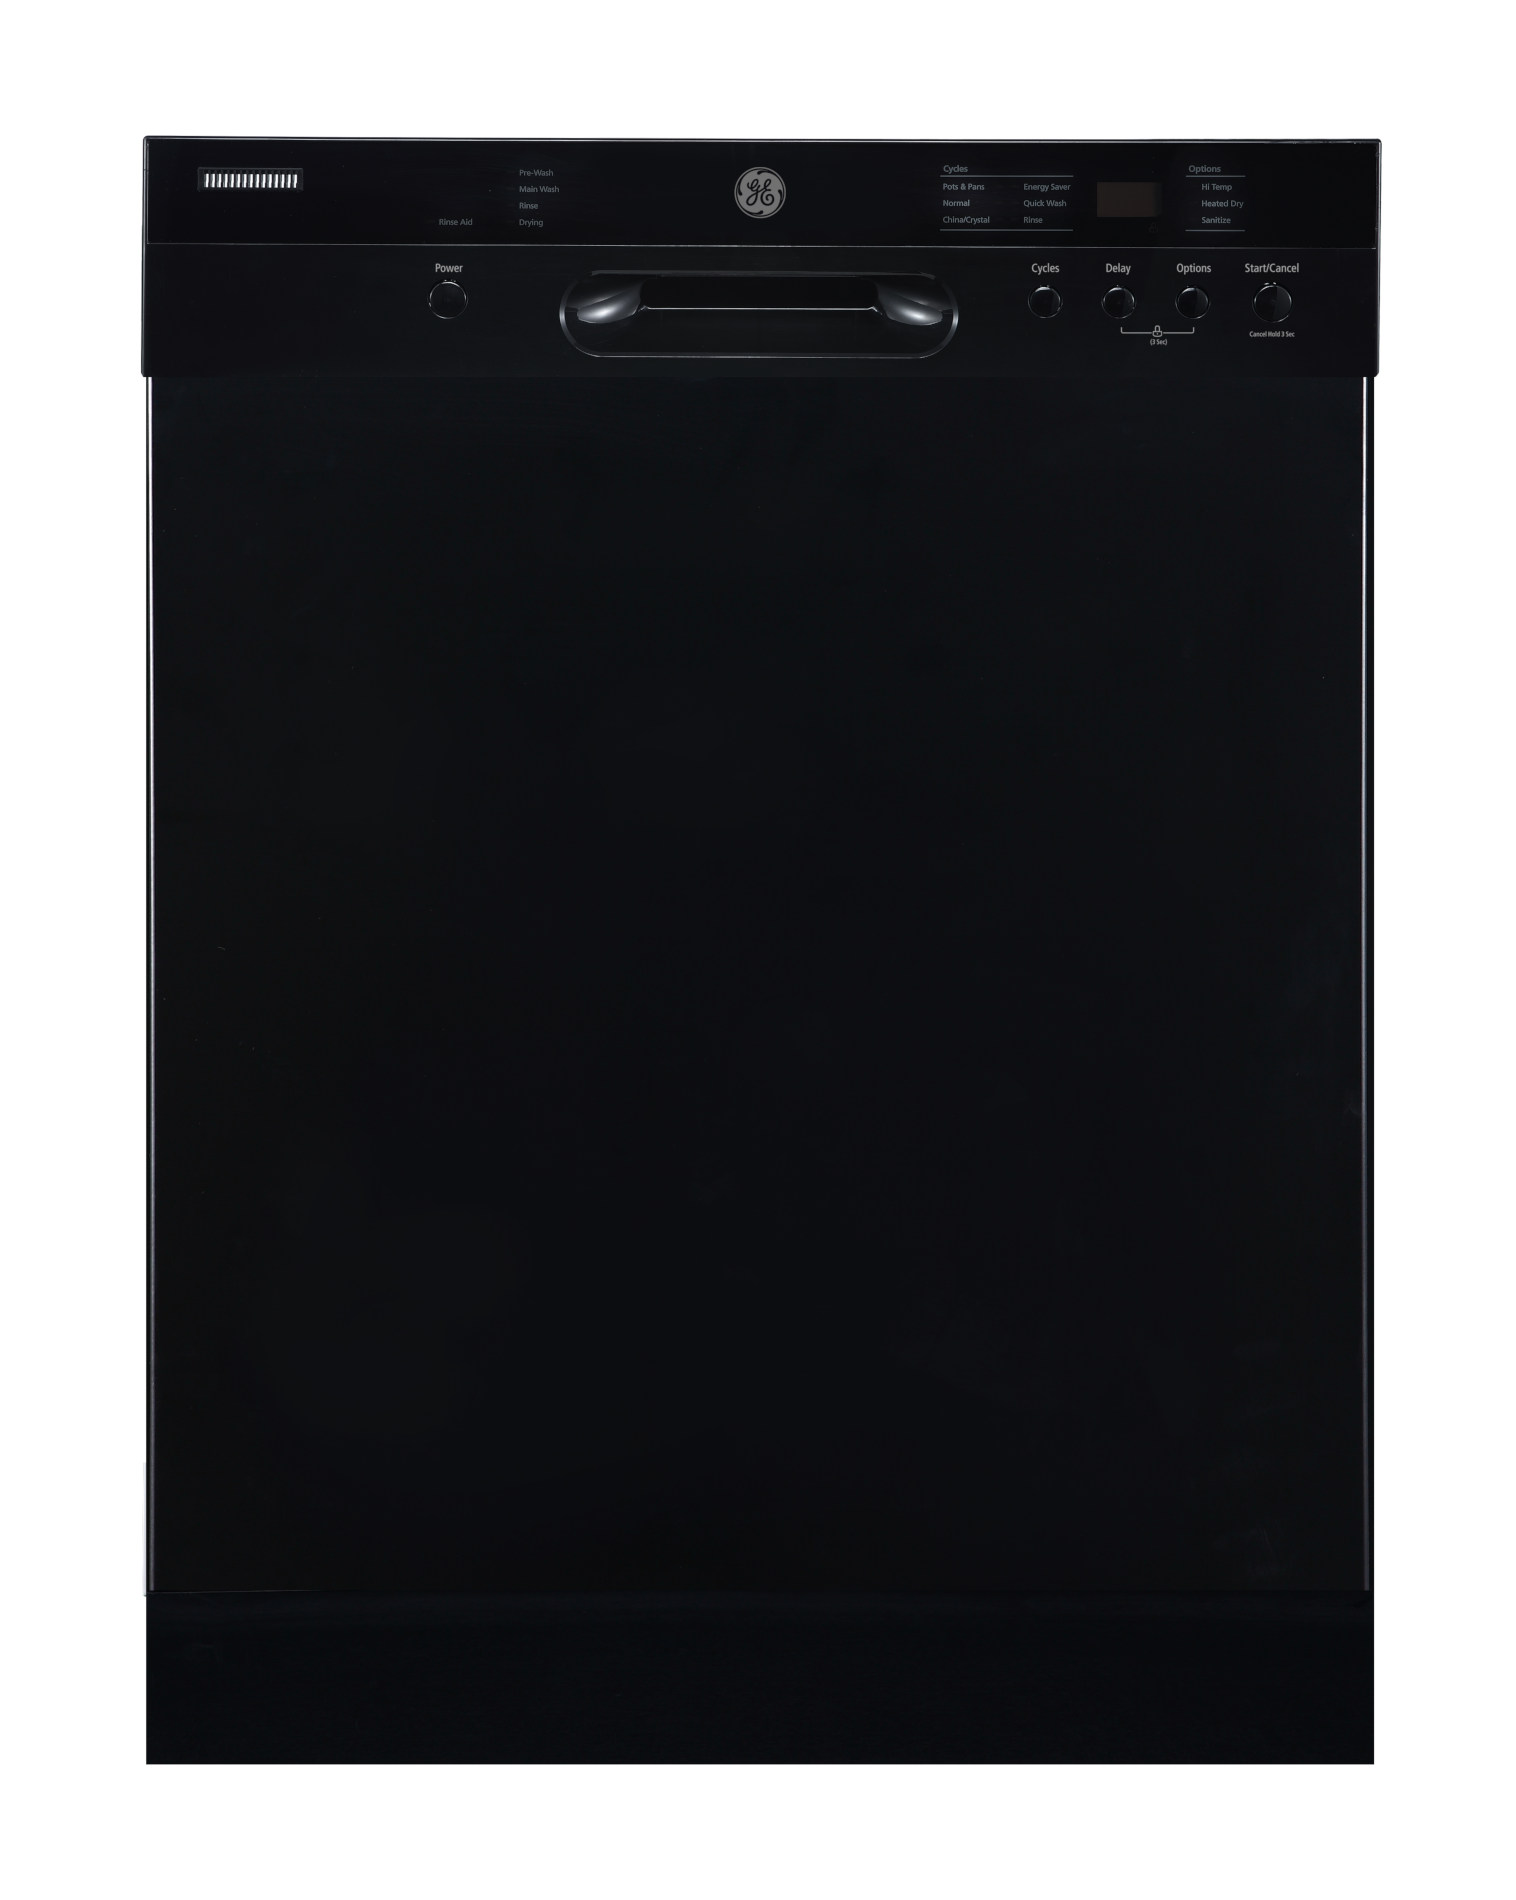 22708 – Black Dishwasher – GBF532SGMBB